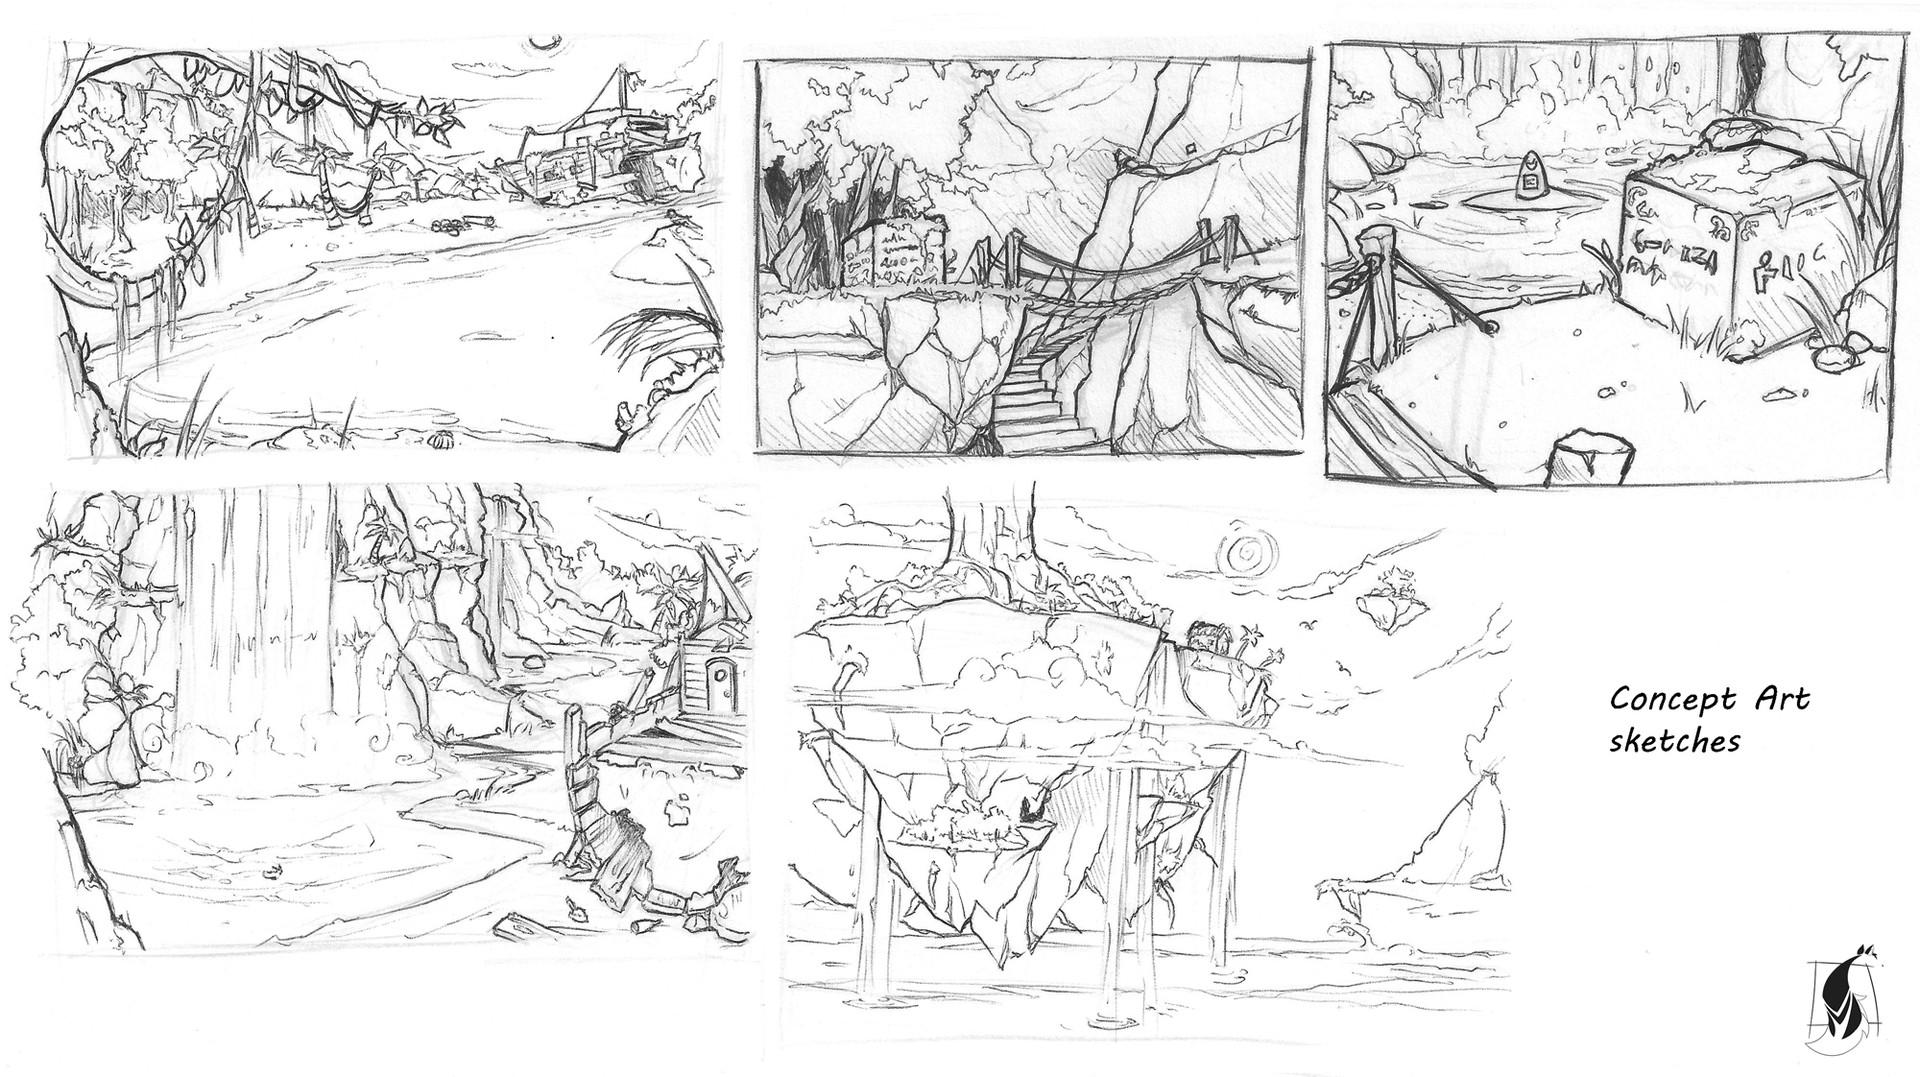 Sketches for environment concept art